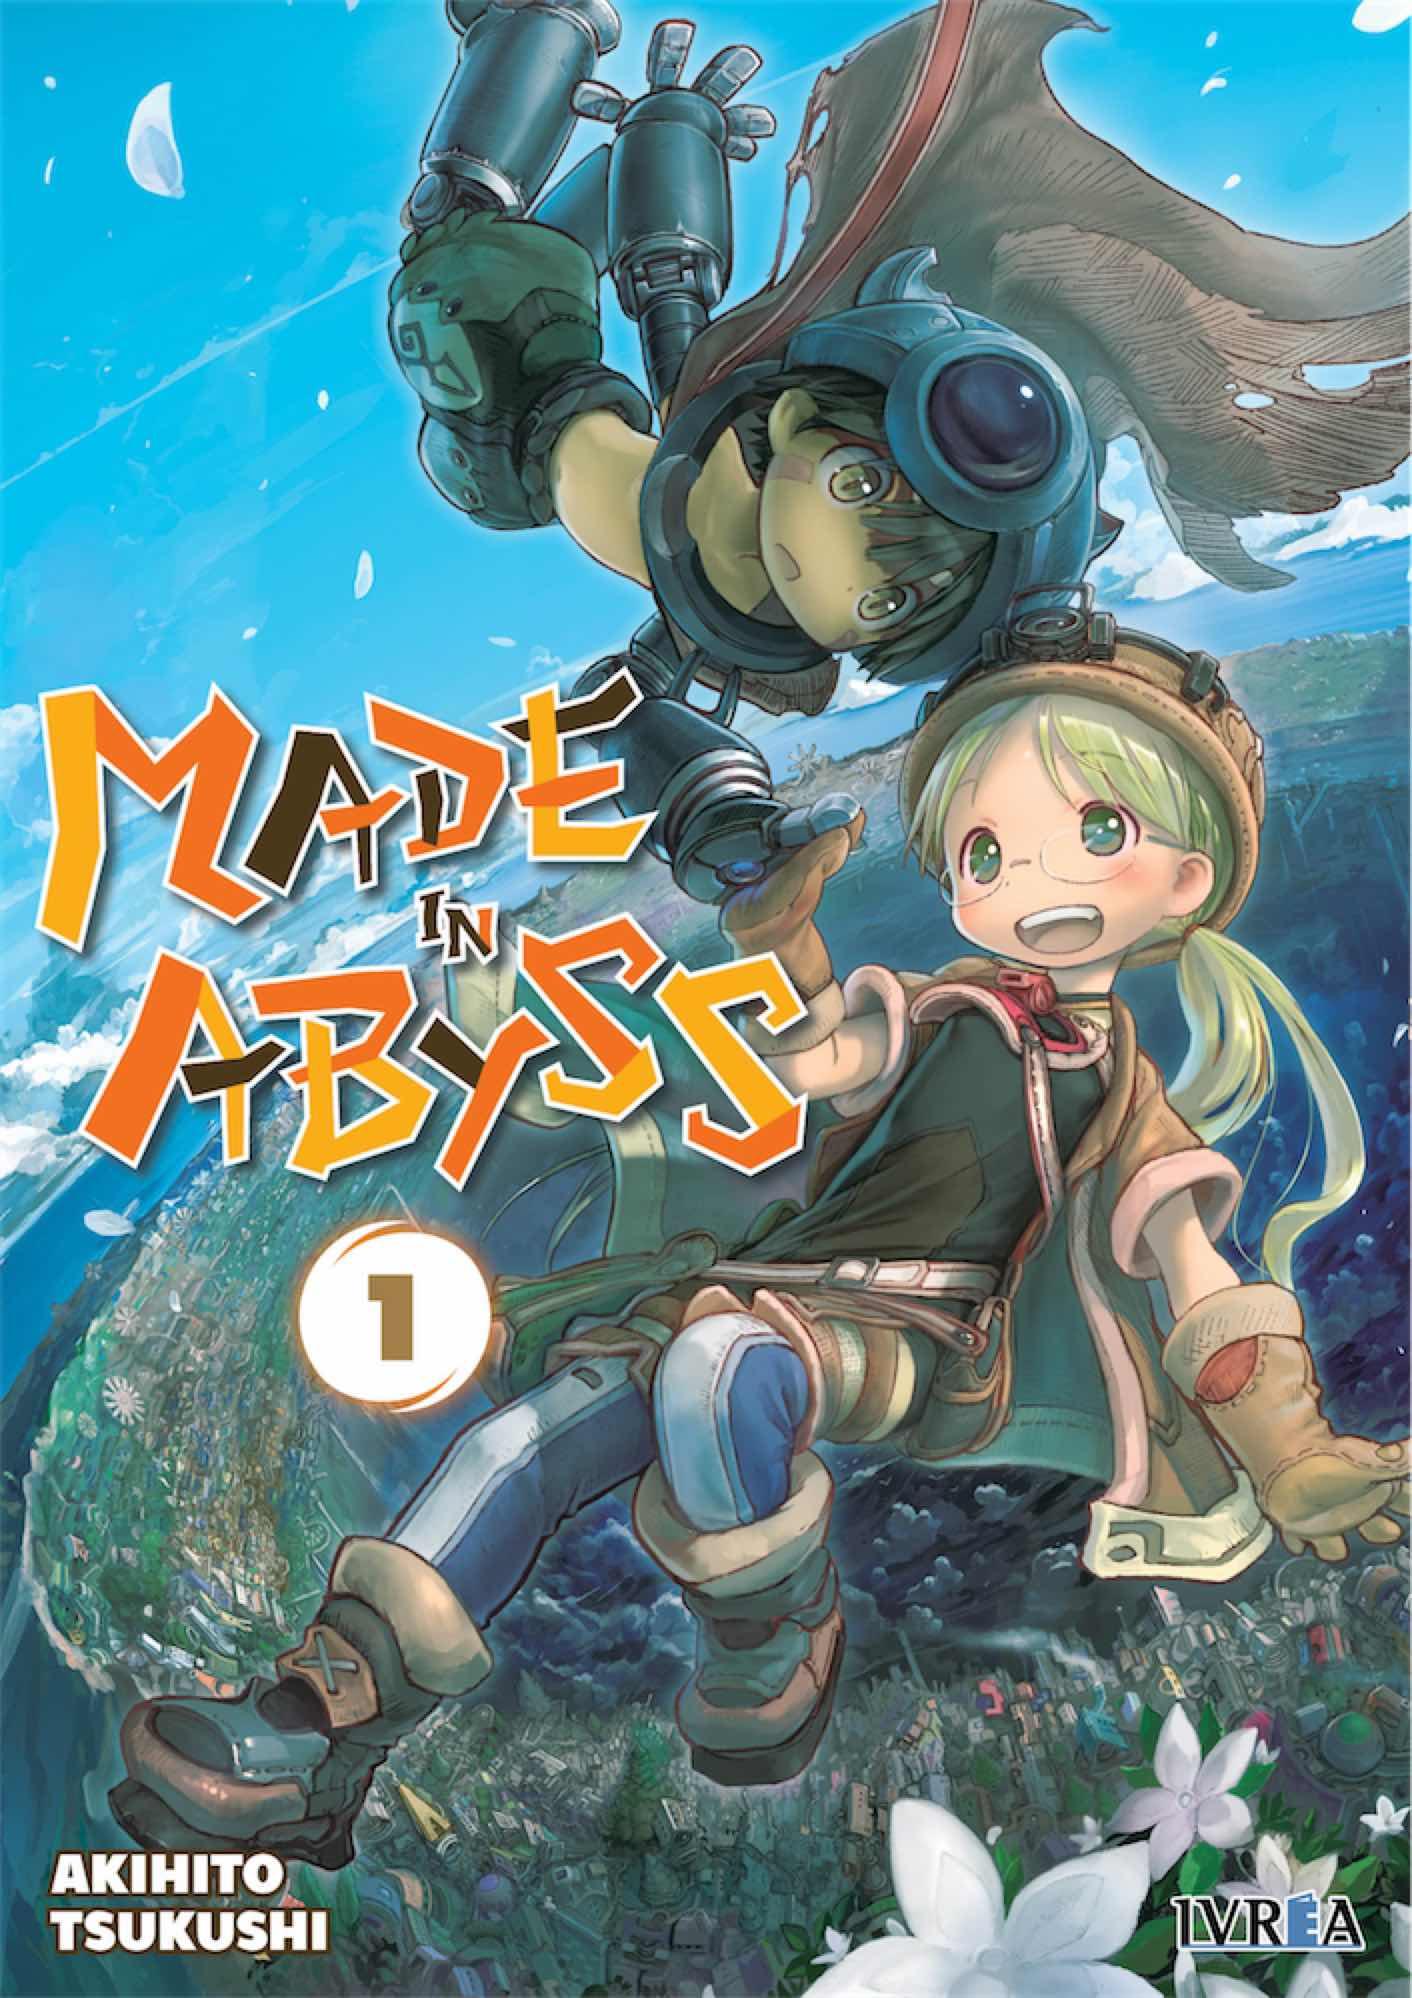 Madeinabyss1